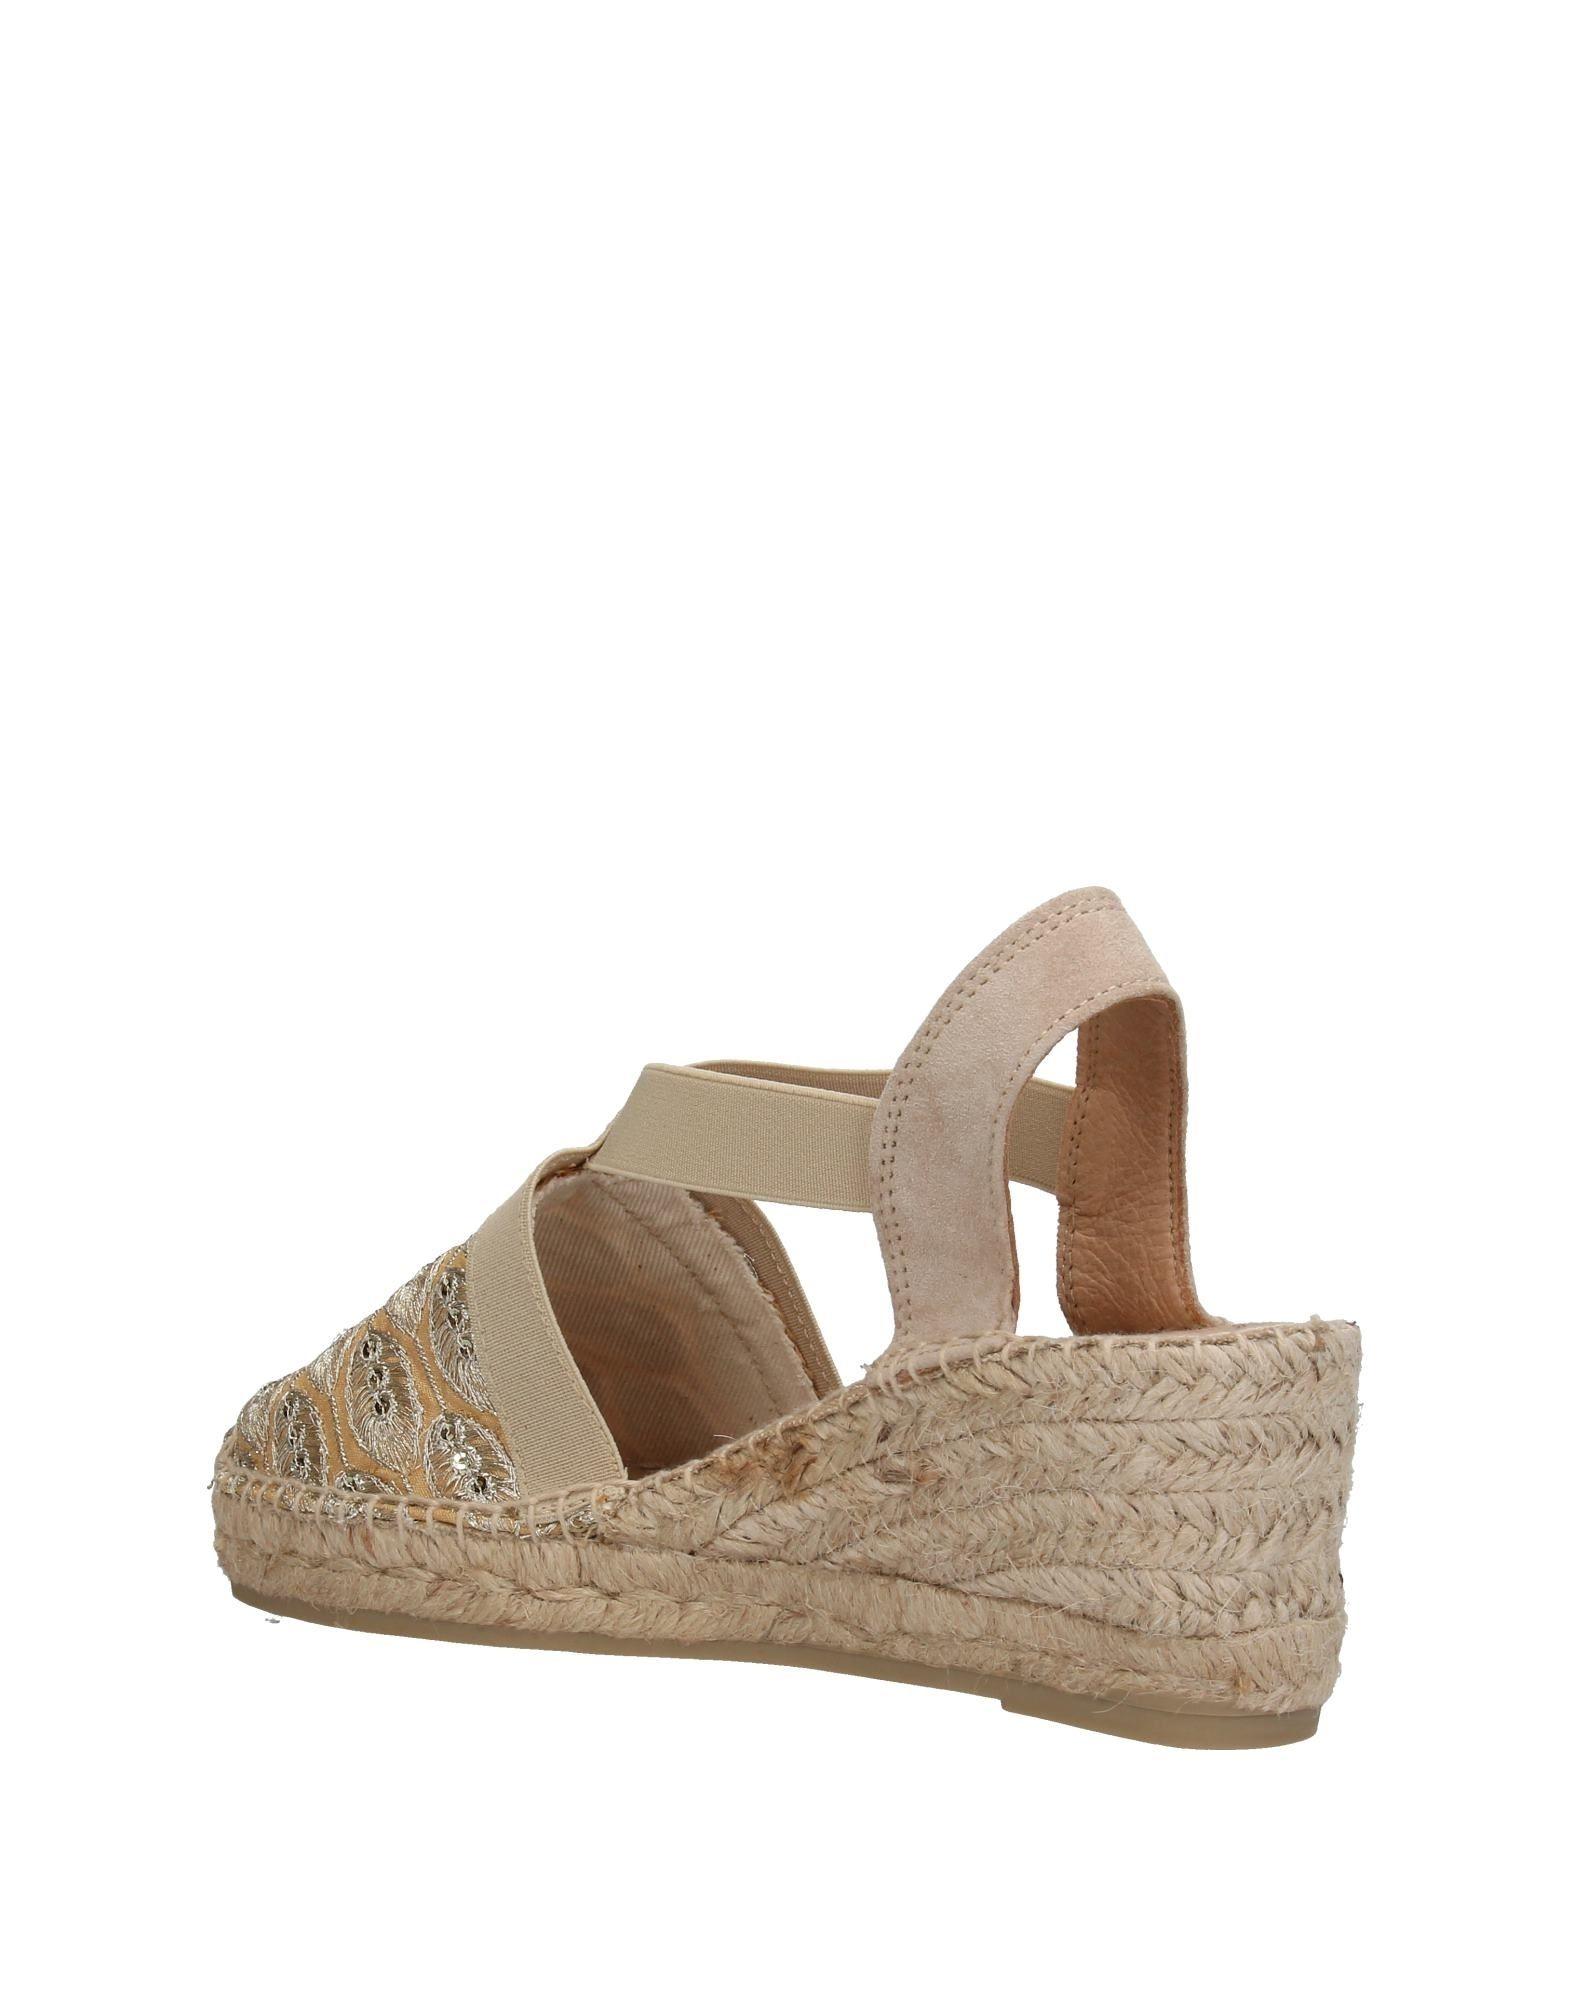 Toni Pons Espadrilles Damen Schuhe  11376259QI Gute Qualität beliebte Schuhe Damen f4bfc7